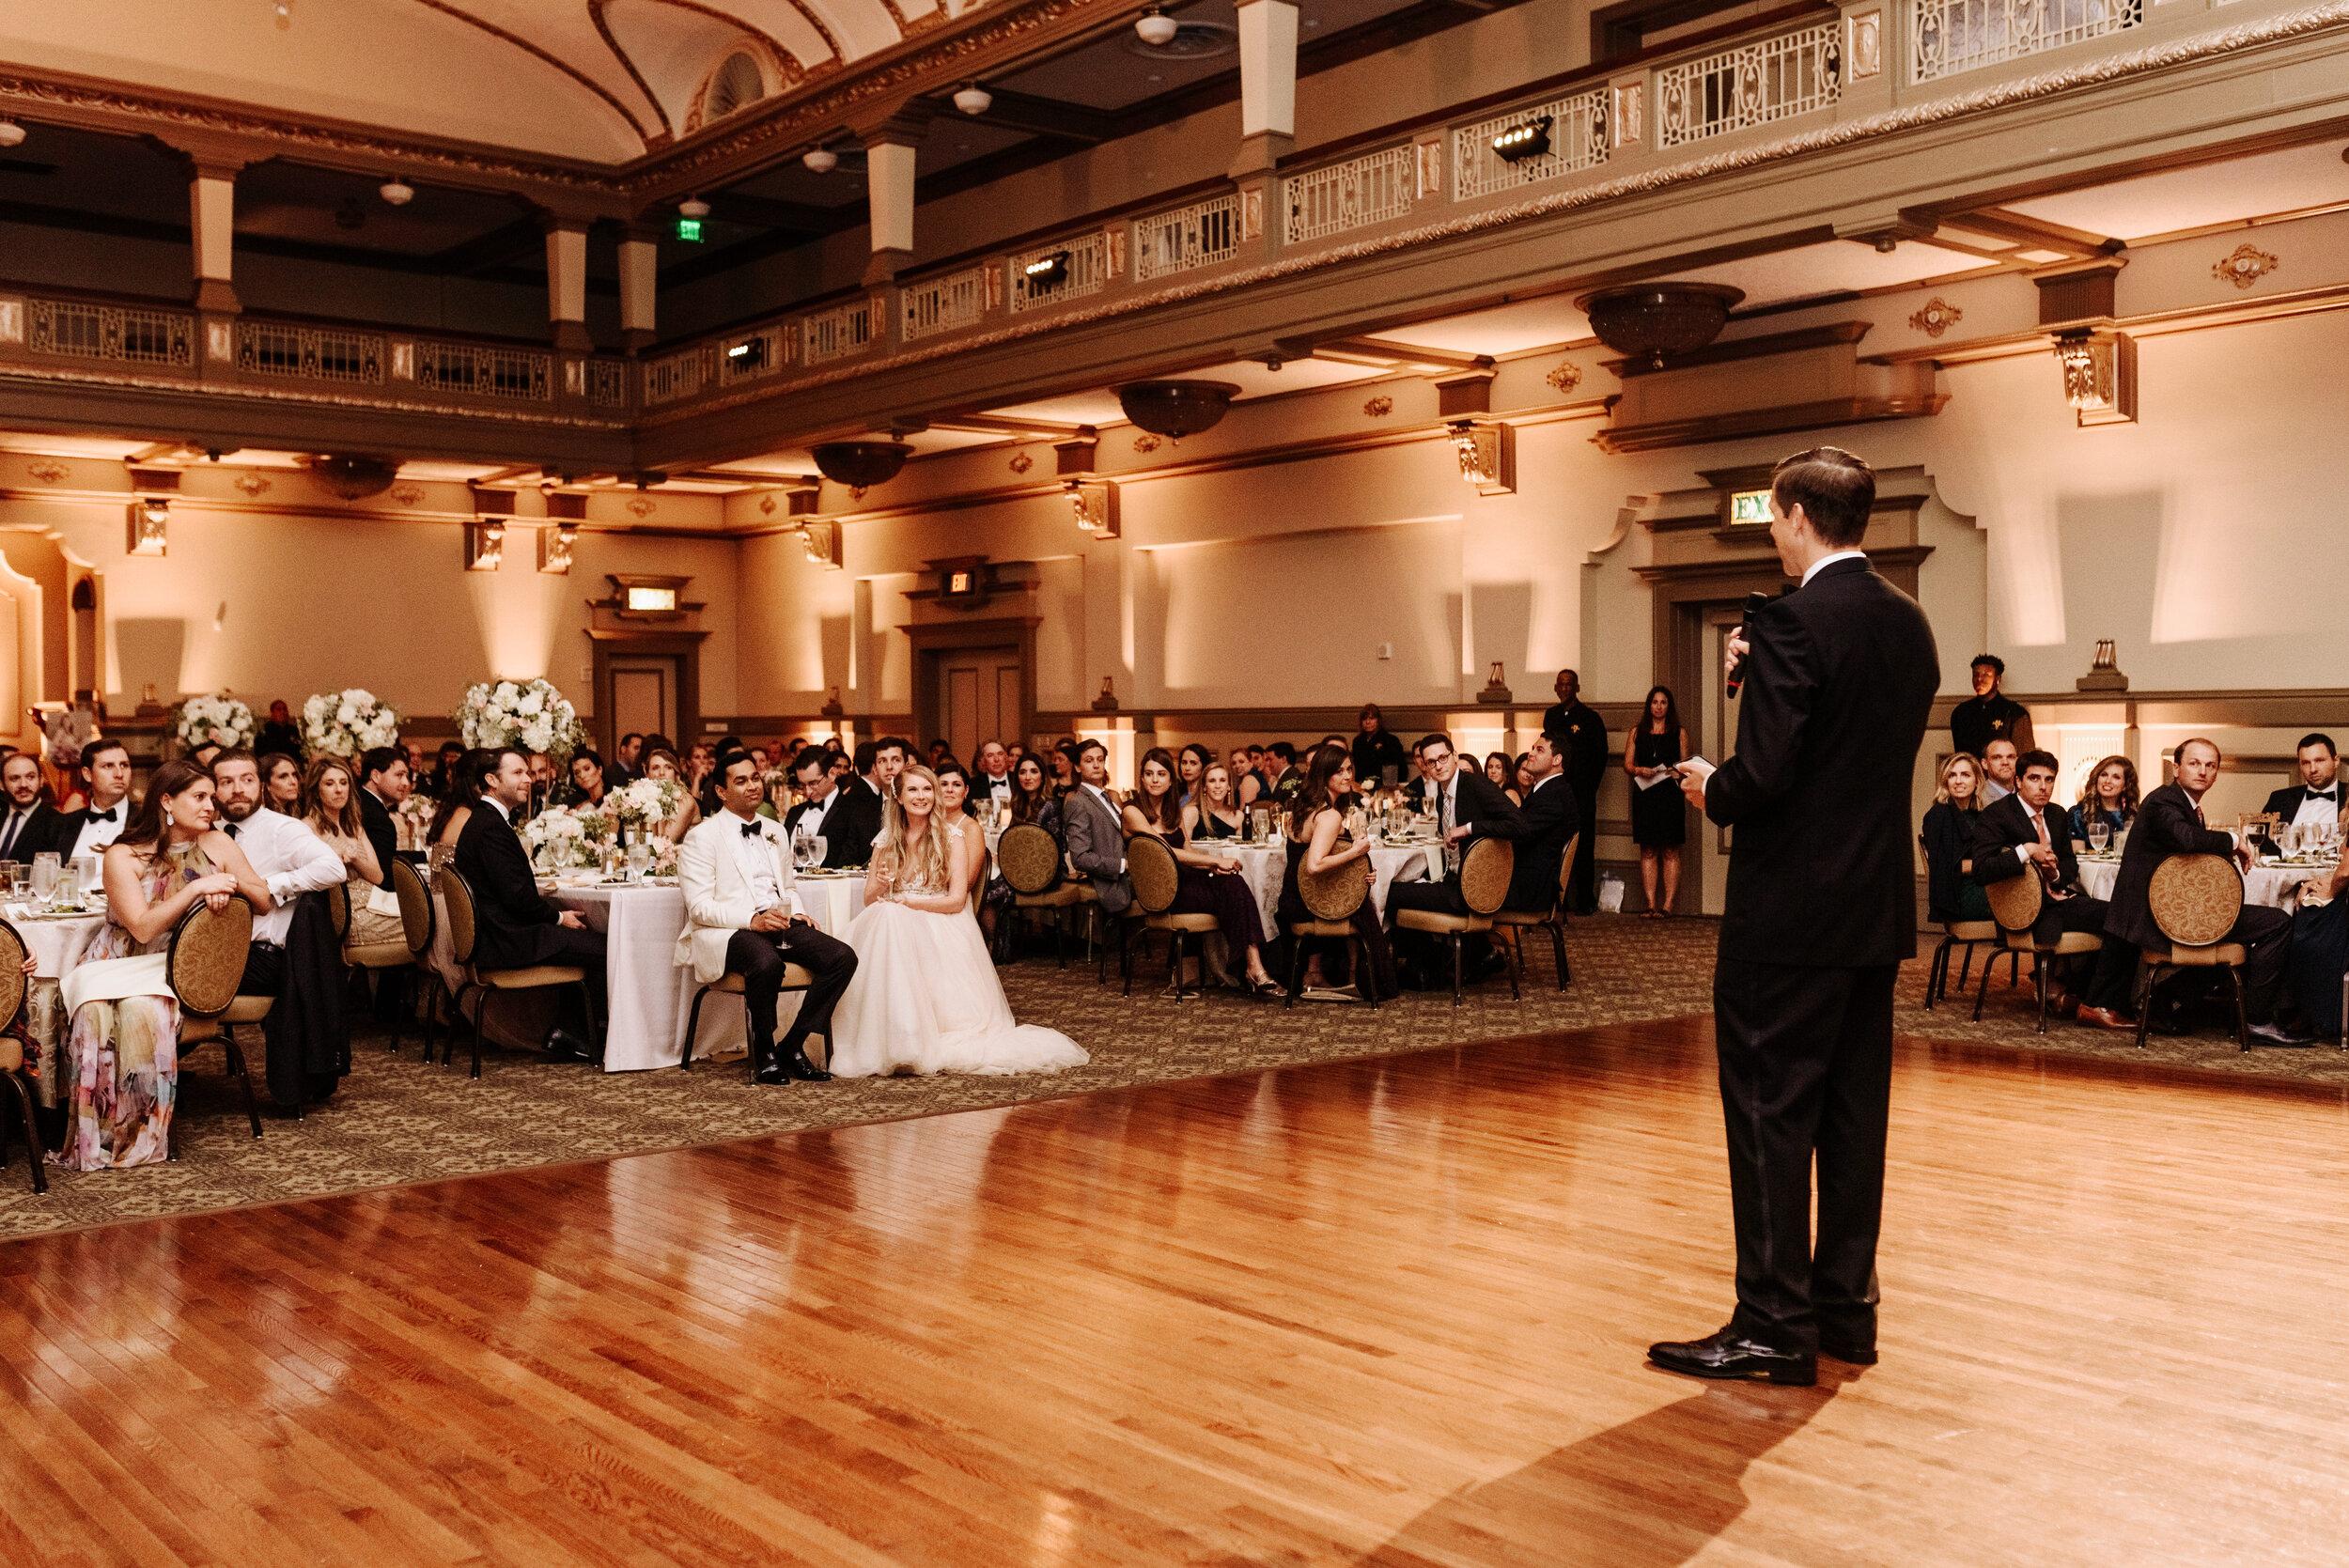 Cassie-Mrunal-Wedding-Quirk-Hotel-John-Marshall-Ballrooms-Richmond-Virginia-Photography-by-V-95.jpg